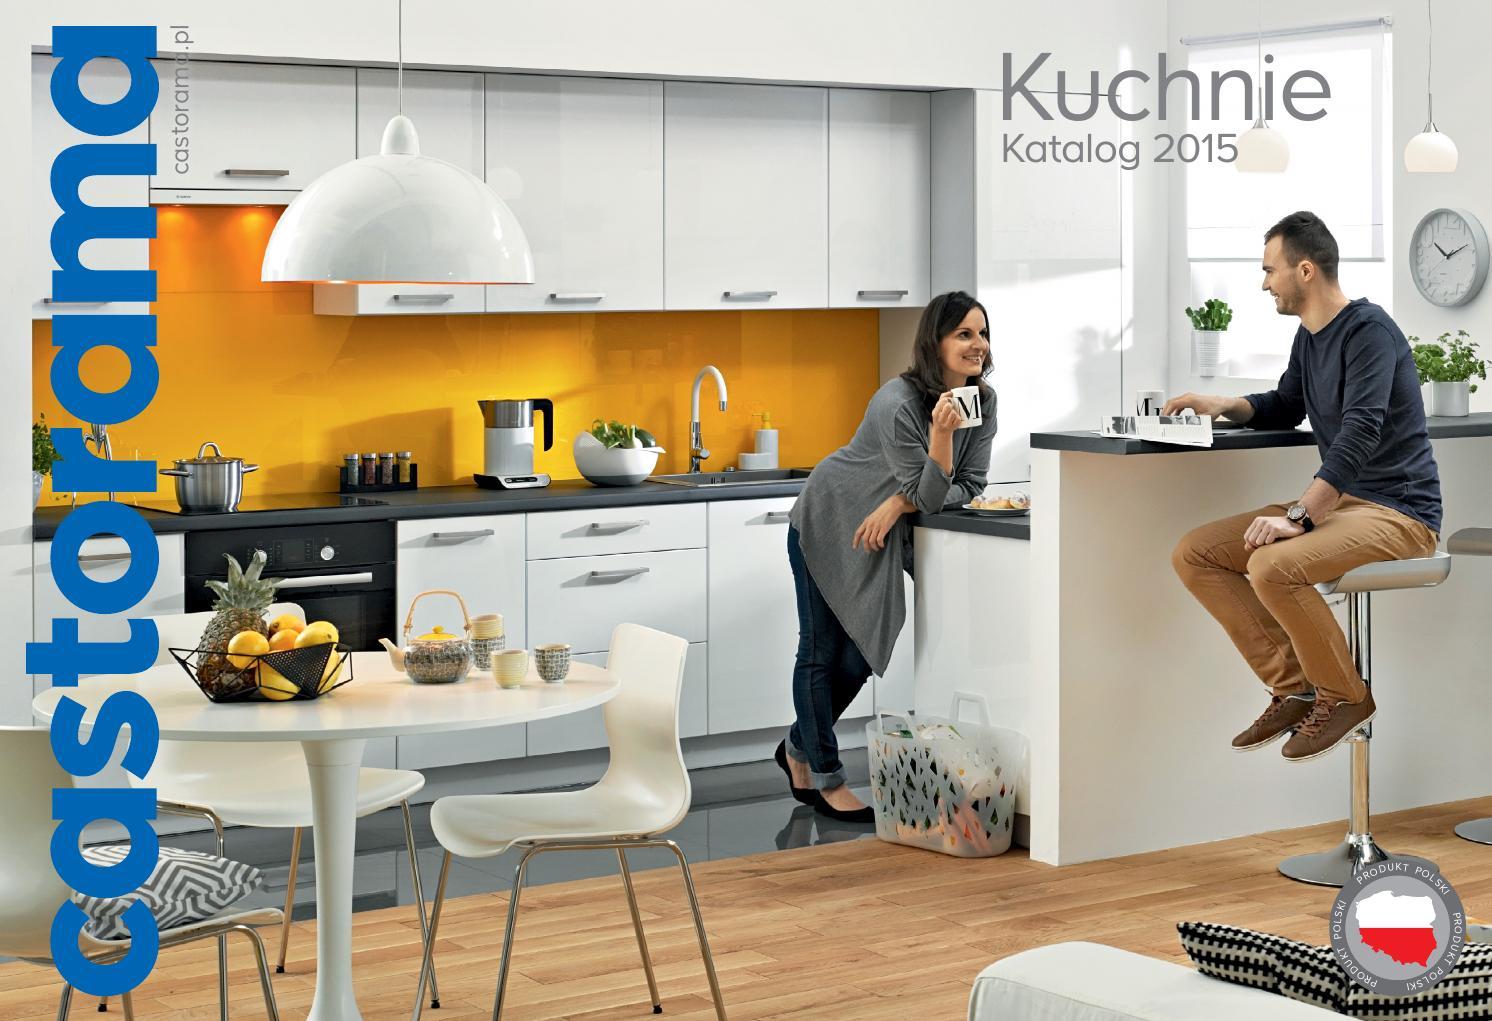 Castorama Katalog Kuchnie 2015 By Finmarket Issuu